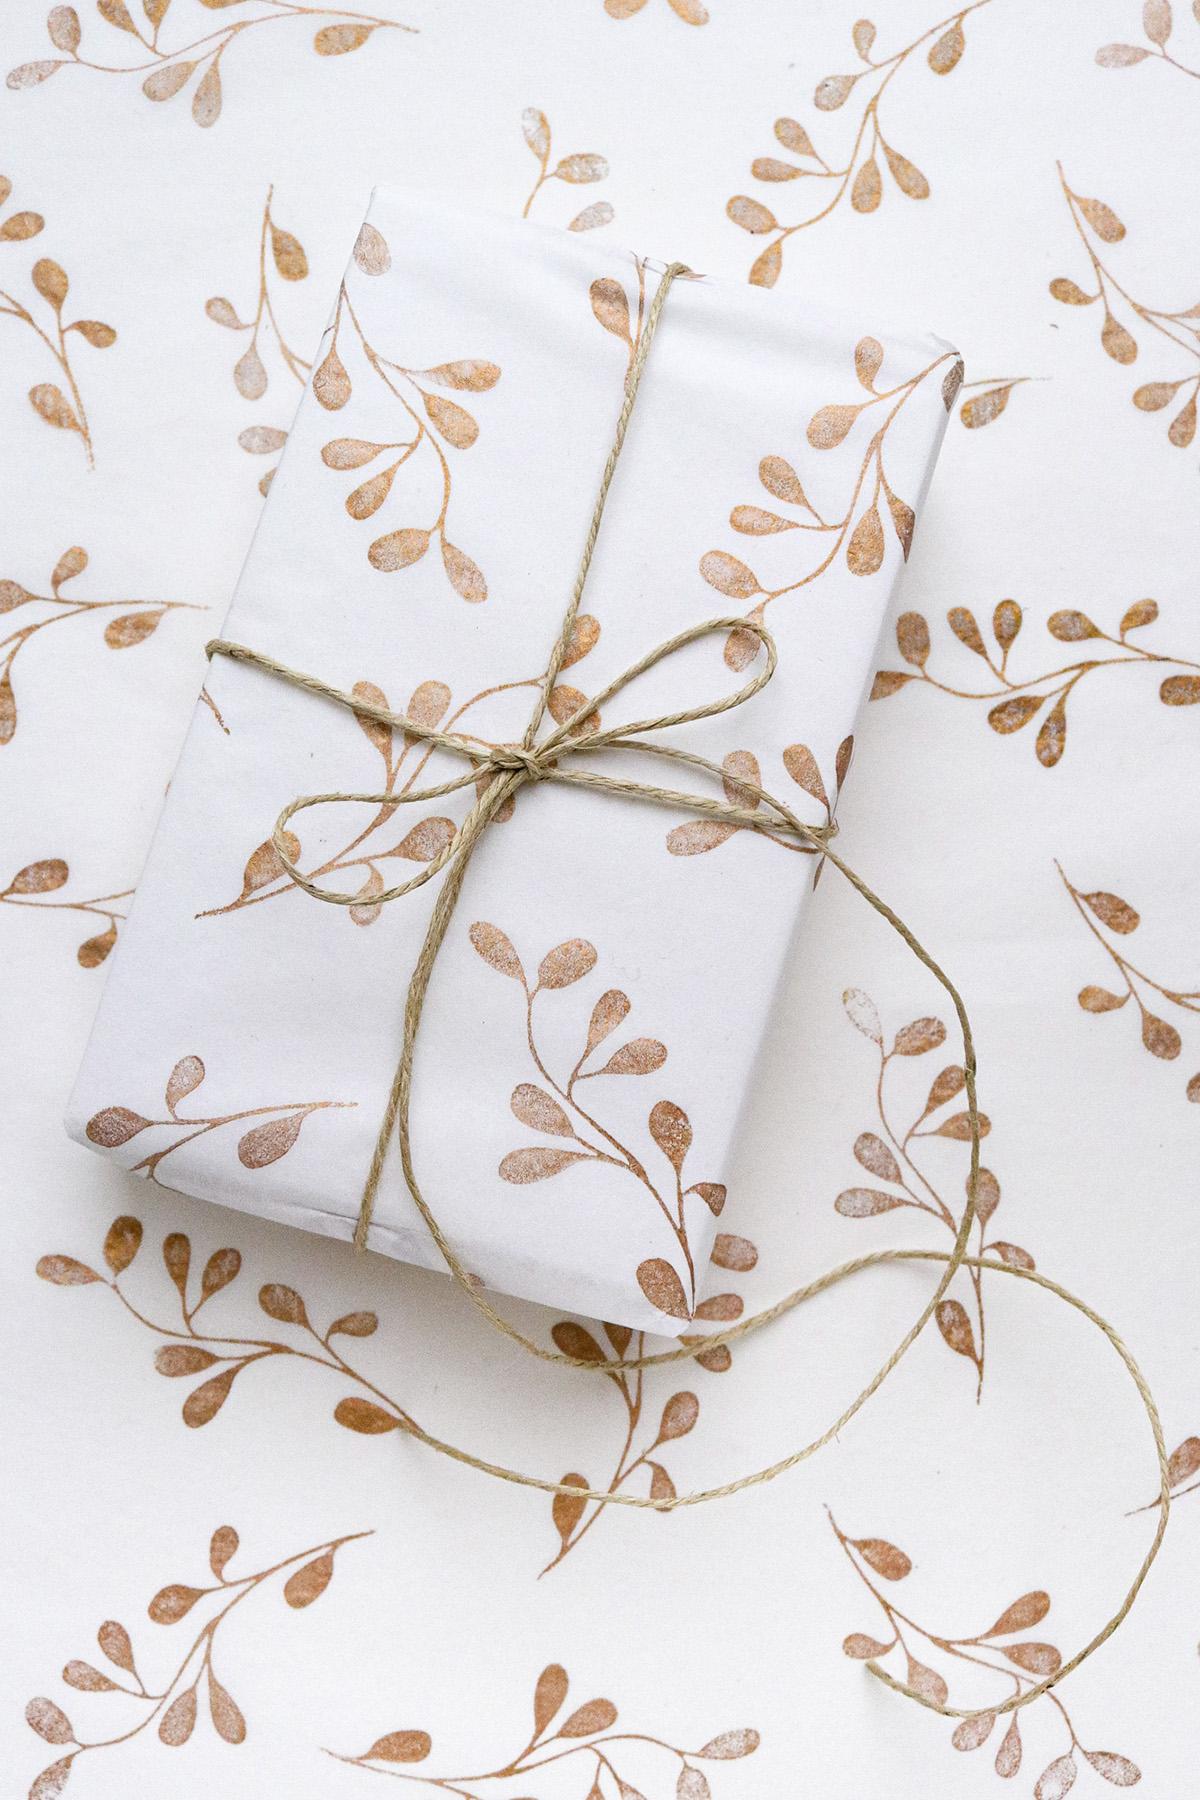 missredfox - onyourcreativetable - Studio Karamelo - Geschenkpapier-stempeln-Pflanzenstempel